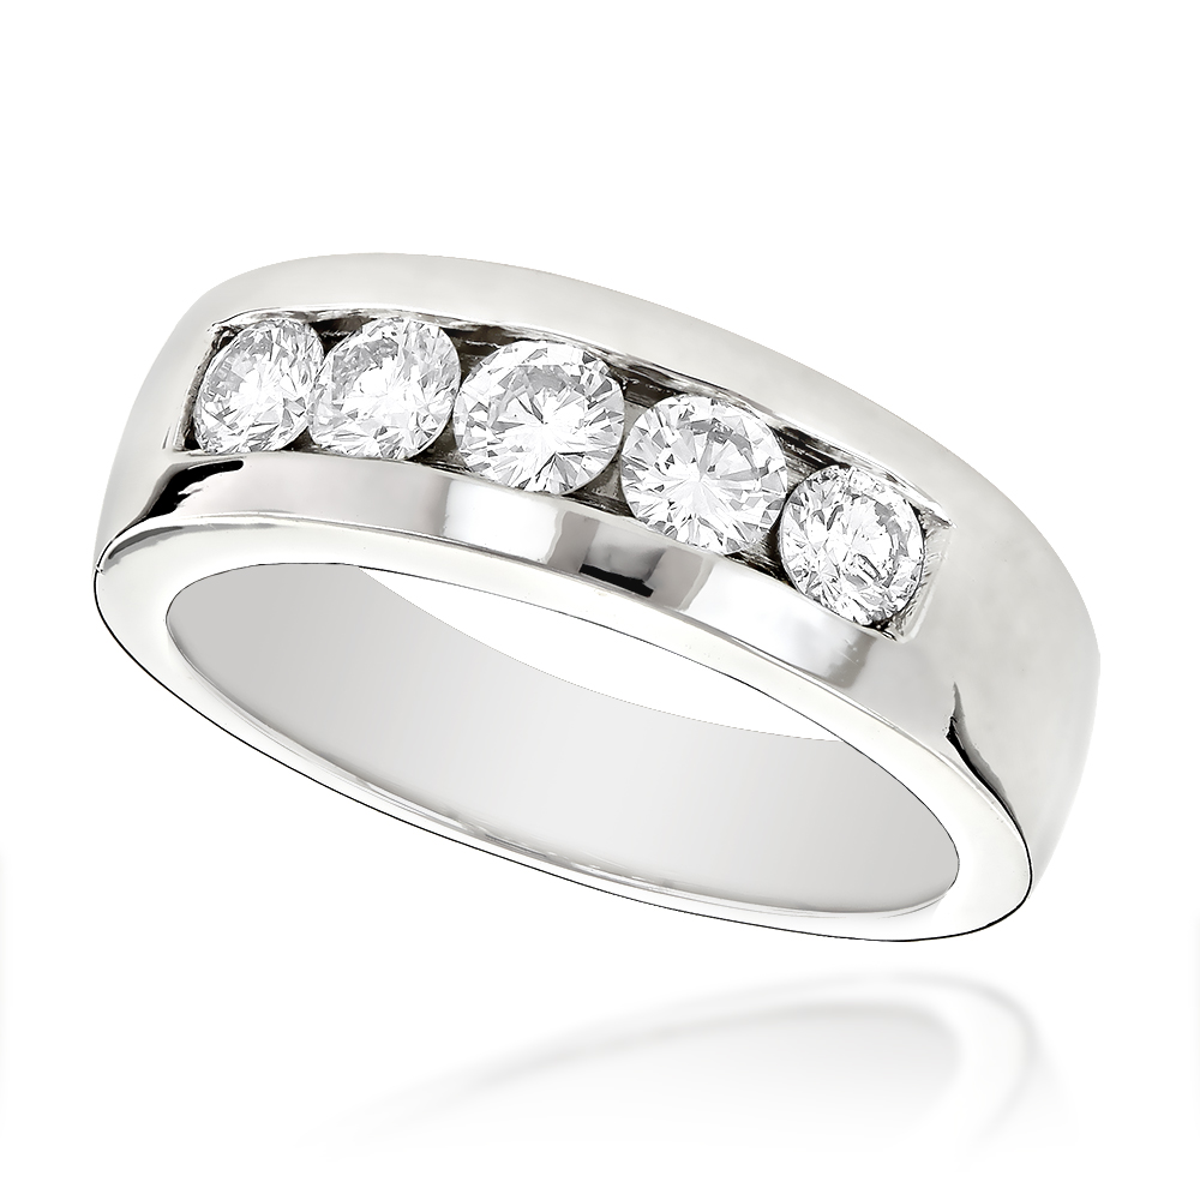 Platinum Men's Diamond Wedding Ring 1ct